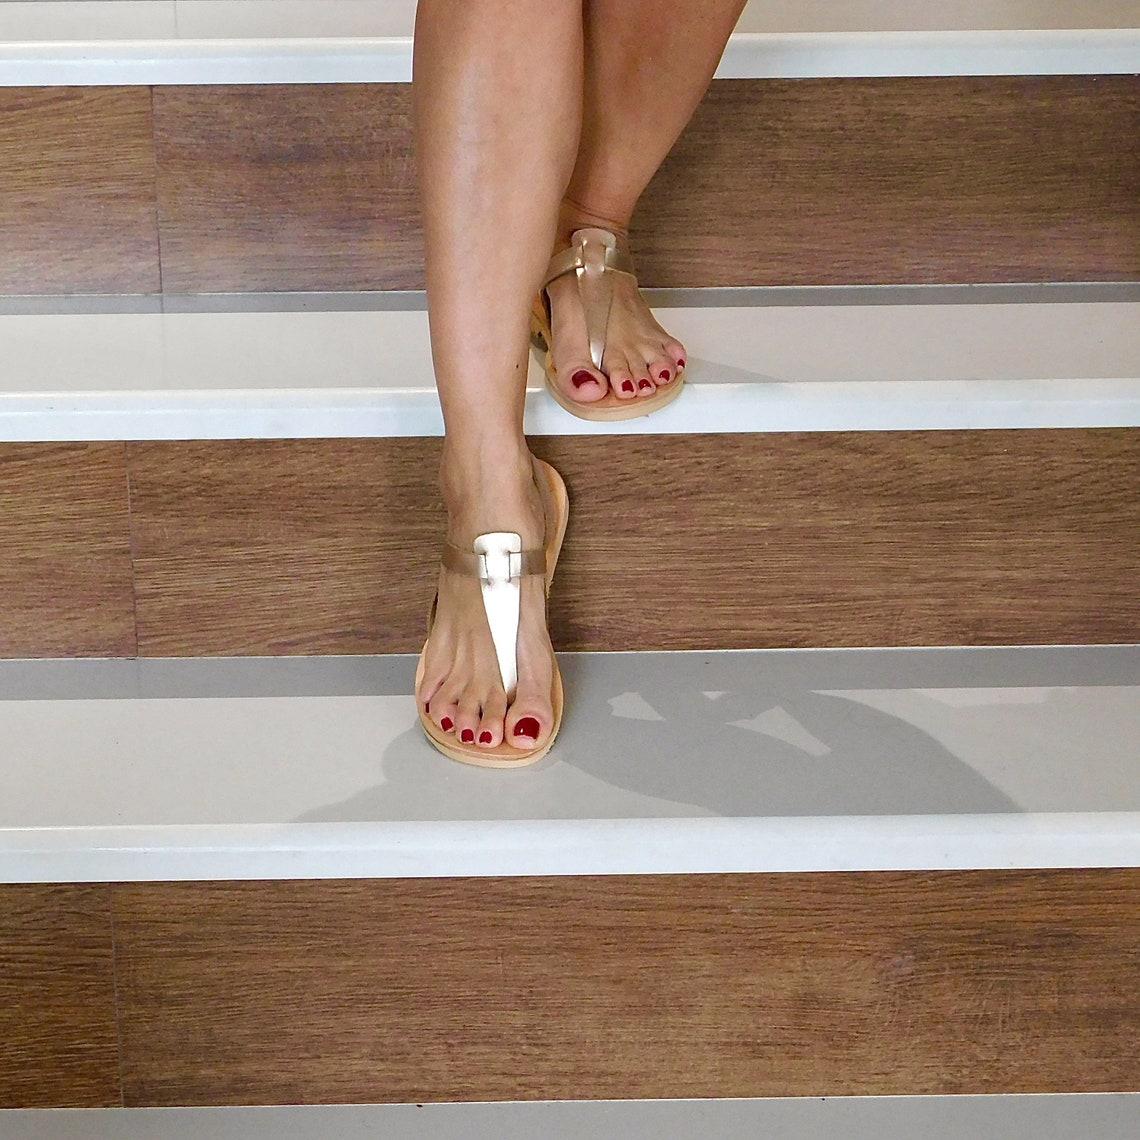 Sandals women, greek sandals, leather sandals, t strap sandals, sandals gold leather, summer sandals, summer shoes leather, sandals flat